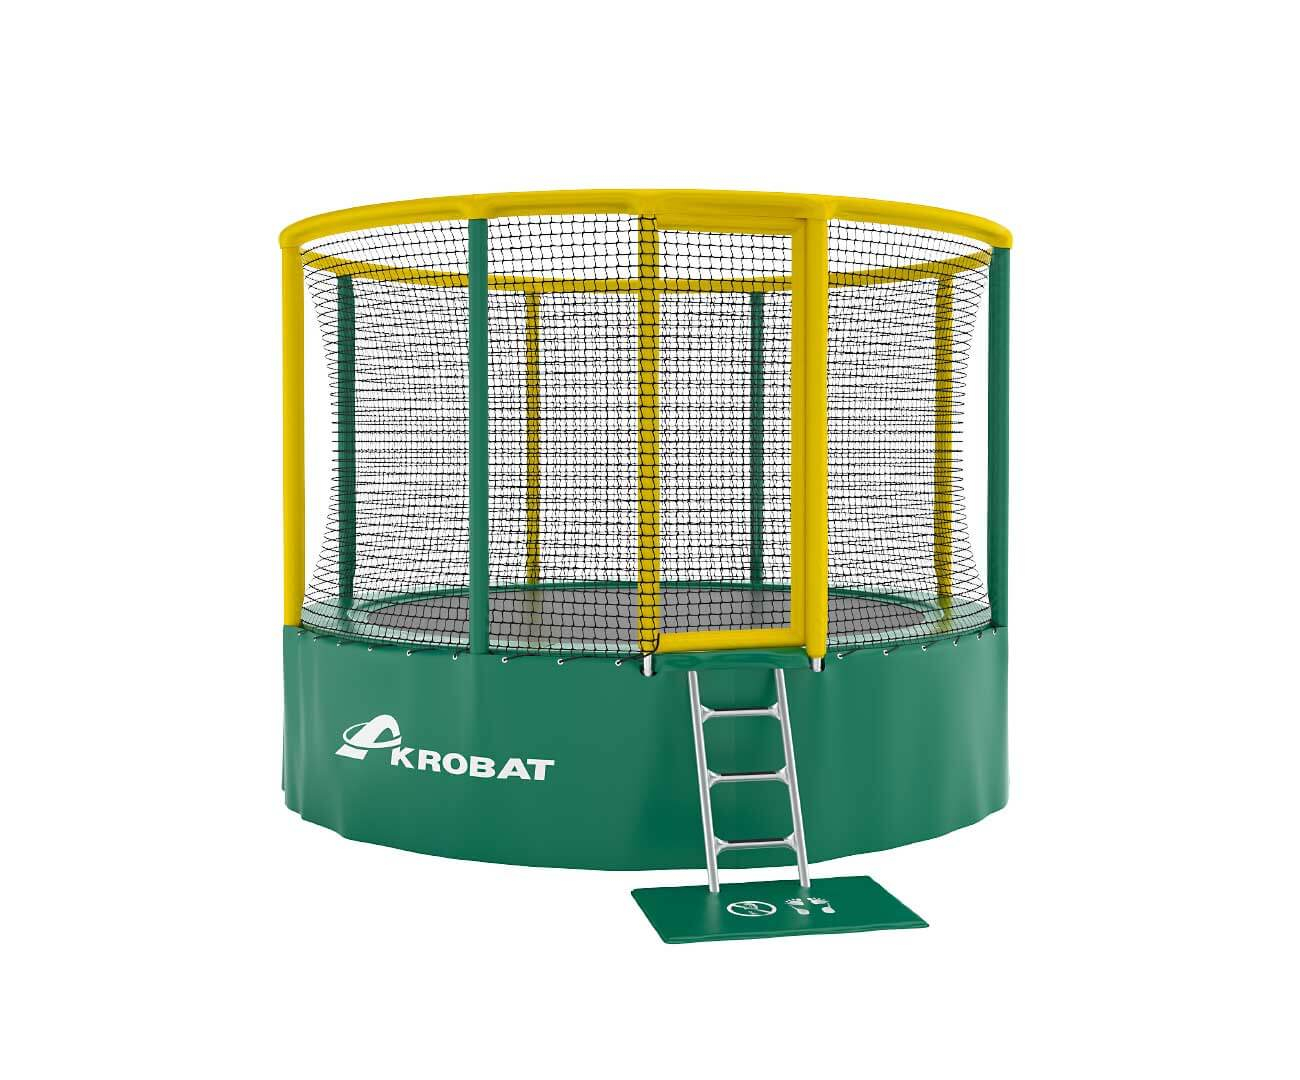 Akrobat Gallus 10 Green-yellow enclosure / Green safety pad /Black jumping mat